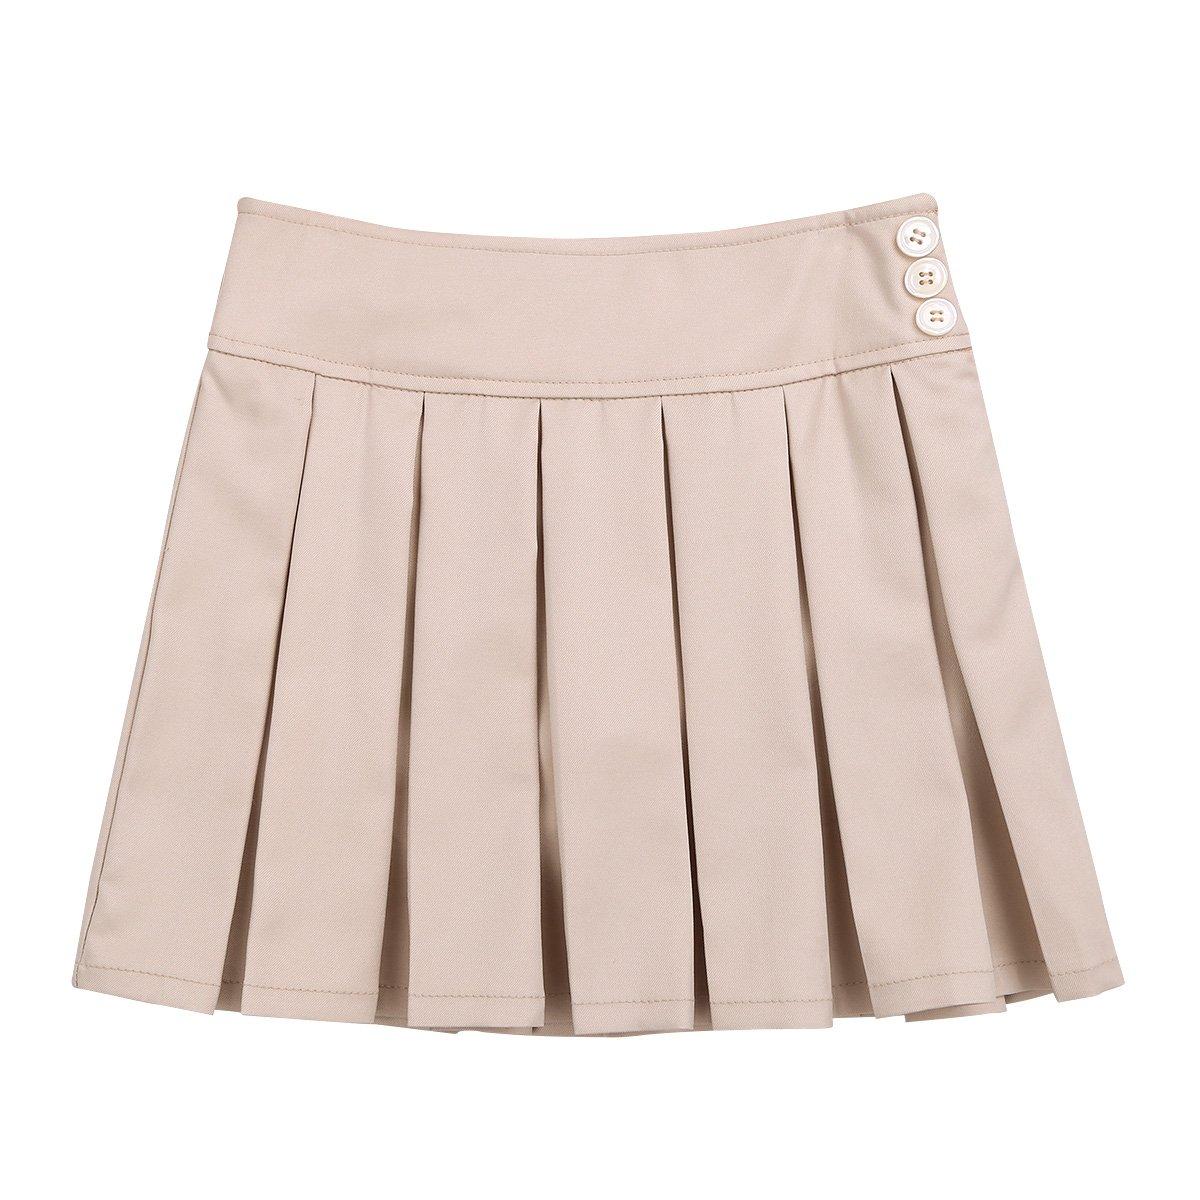 Freebily Kids Girls' Two-Tab Pleated Side Zipper Buttons Scooter School Uniform Skirt Khaki (Side Zipper Buttons) 12